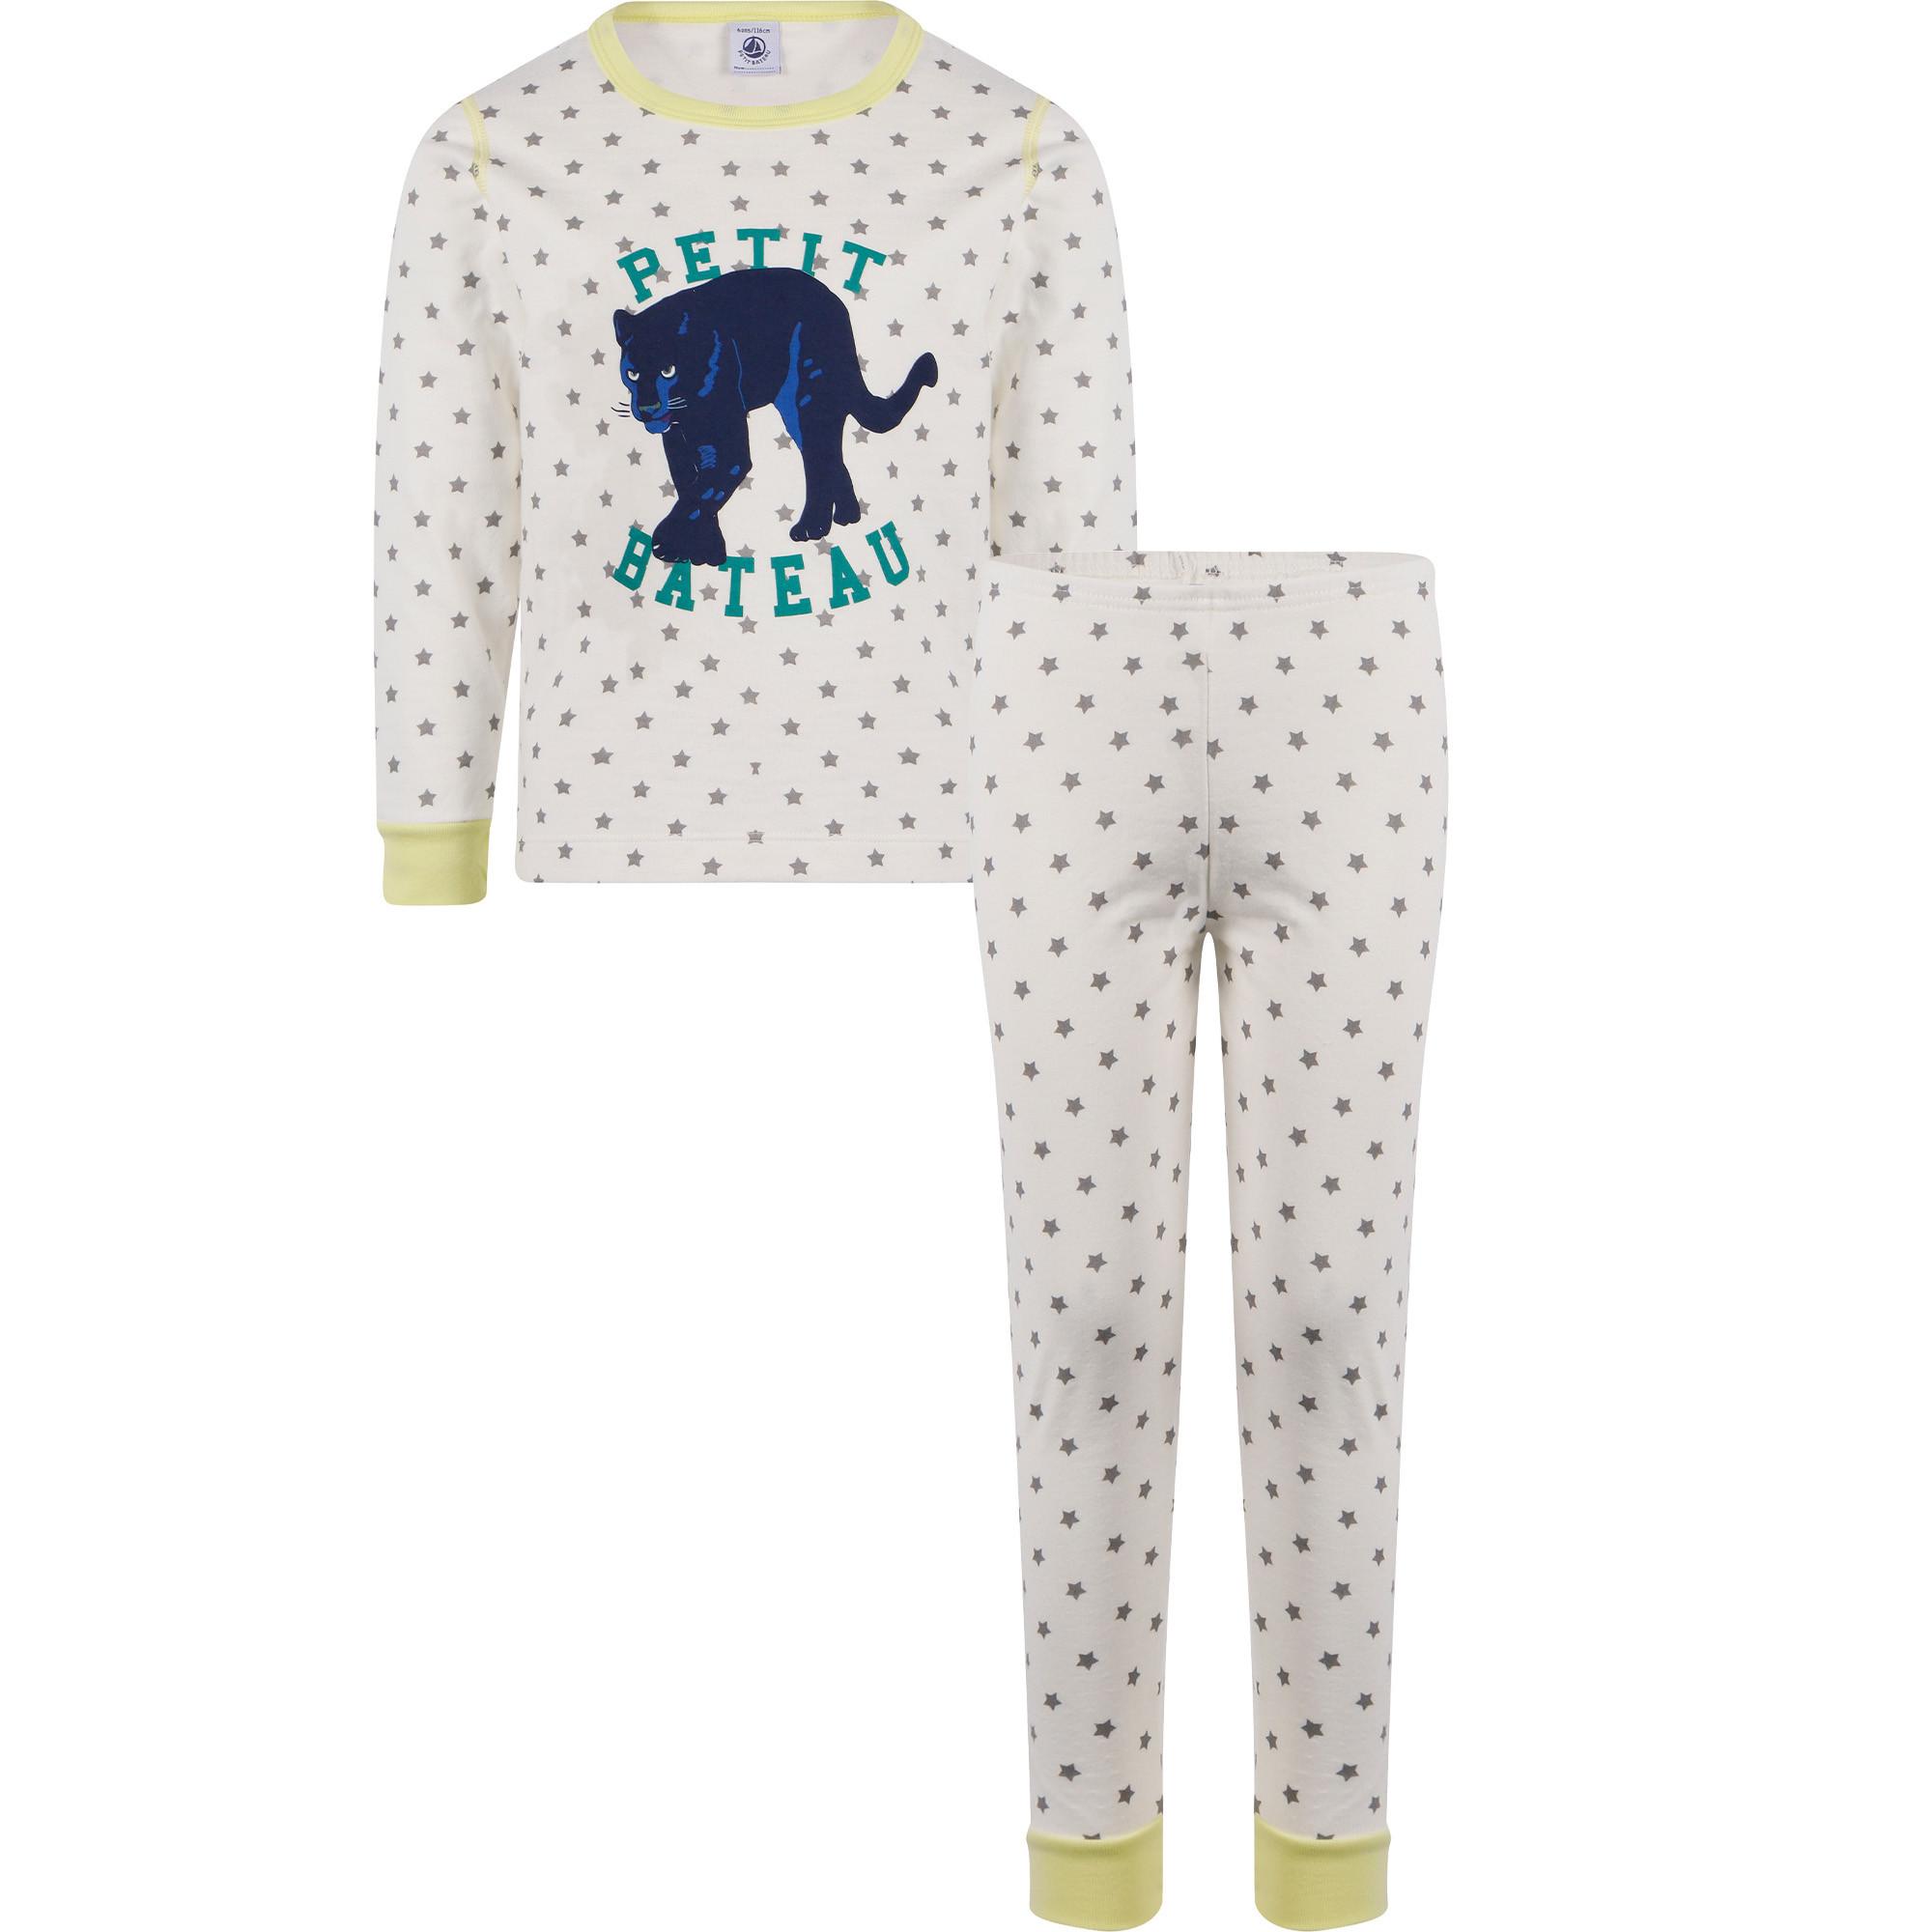 Petit Bateau Puma Logo Pyjamas in White — BAMBINIFASHION.COM